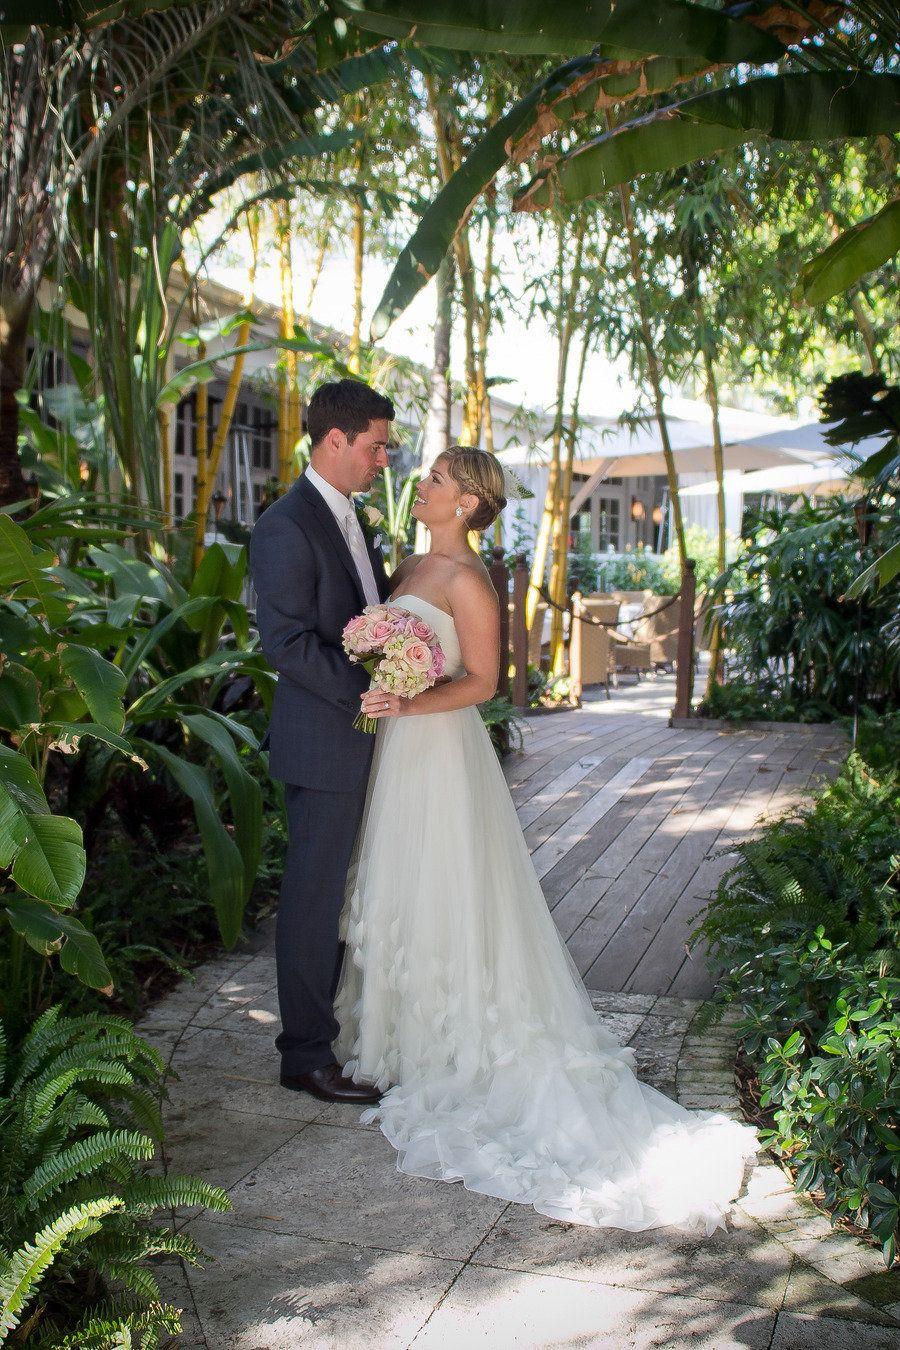 Miami Wedding At The Palms By Erika Delgado Photography Read More Http